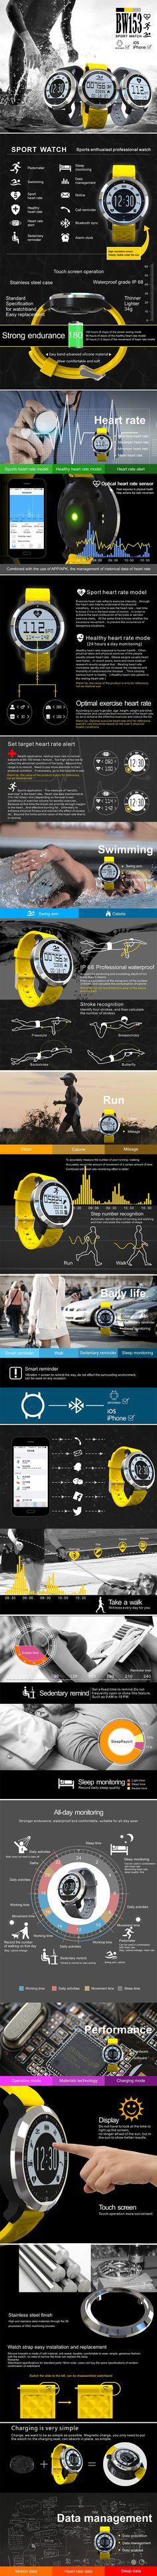 GX-BW153 Smart Bracelet Sleep Heart Rate Monitor IP68 Waterproof Fitness Tracker Sport Watch at Banggood - mens waterproof watches, mens watches buy online, quality mens watches - smart bracelet fitness tracker watches - amzn.to/2ijjZXZ Electronics - Wearable Technology - Clips, Arm & Wristbands - Women's Smart Watches for Sport - http://amzn.to/2kHNvw9